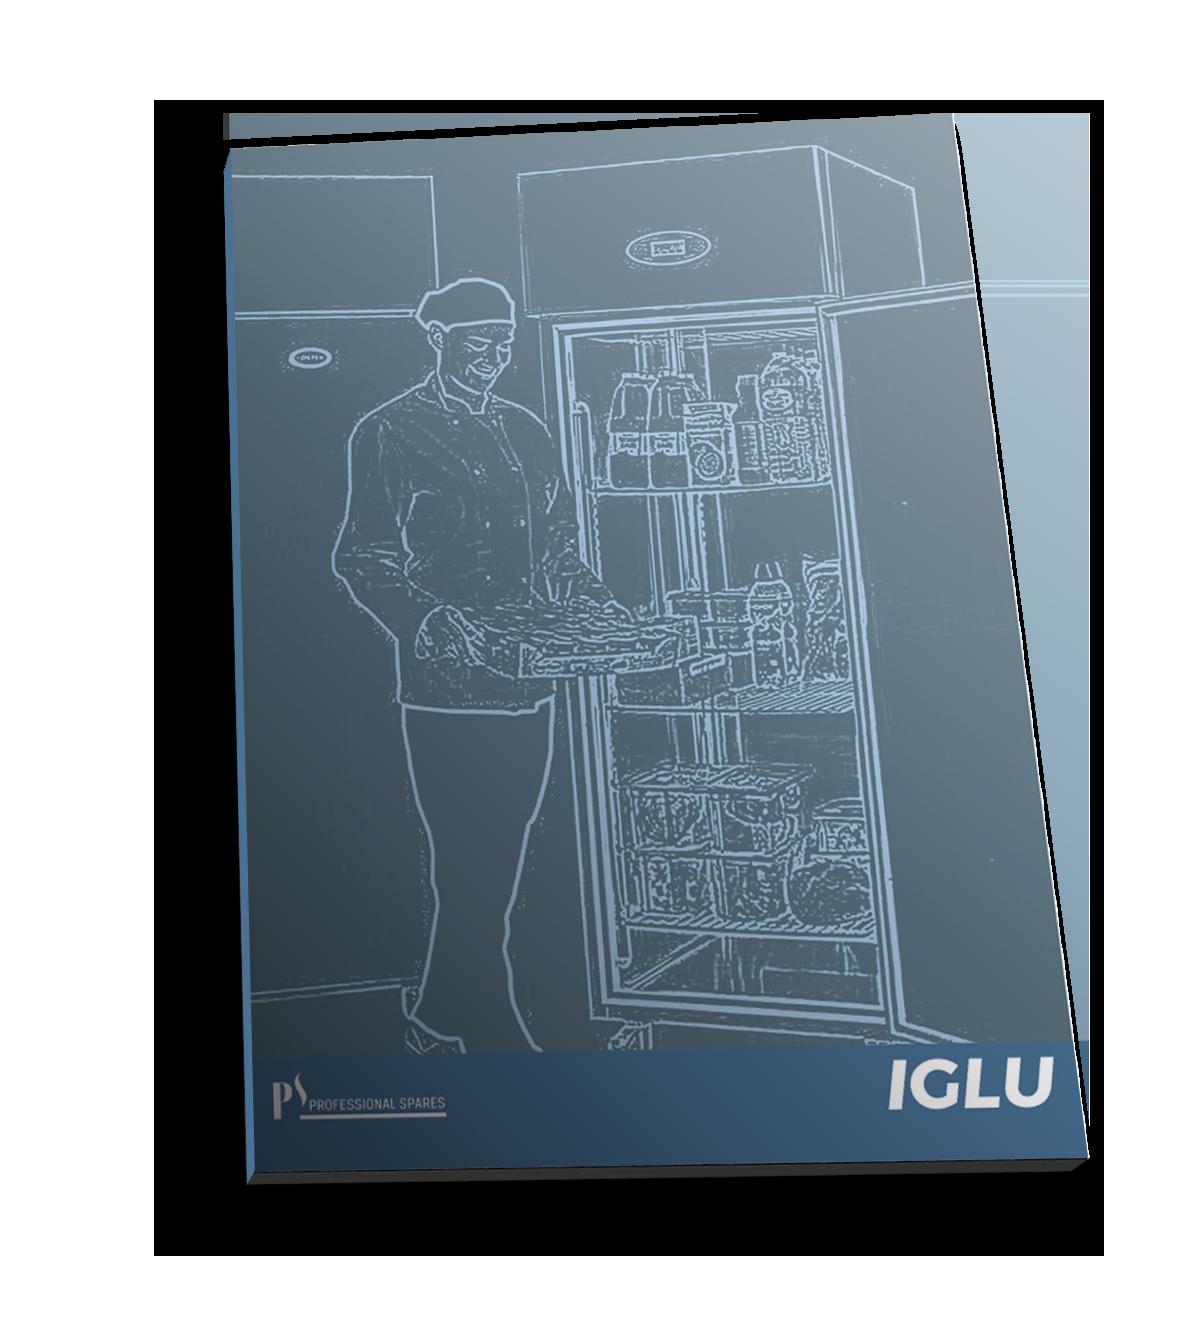 IGLU-catalogo